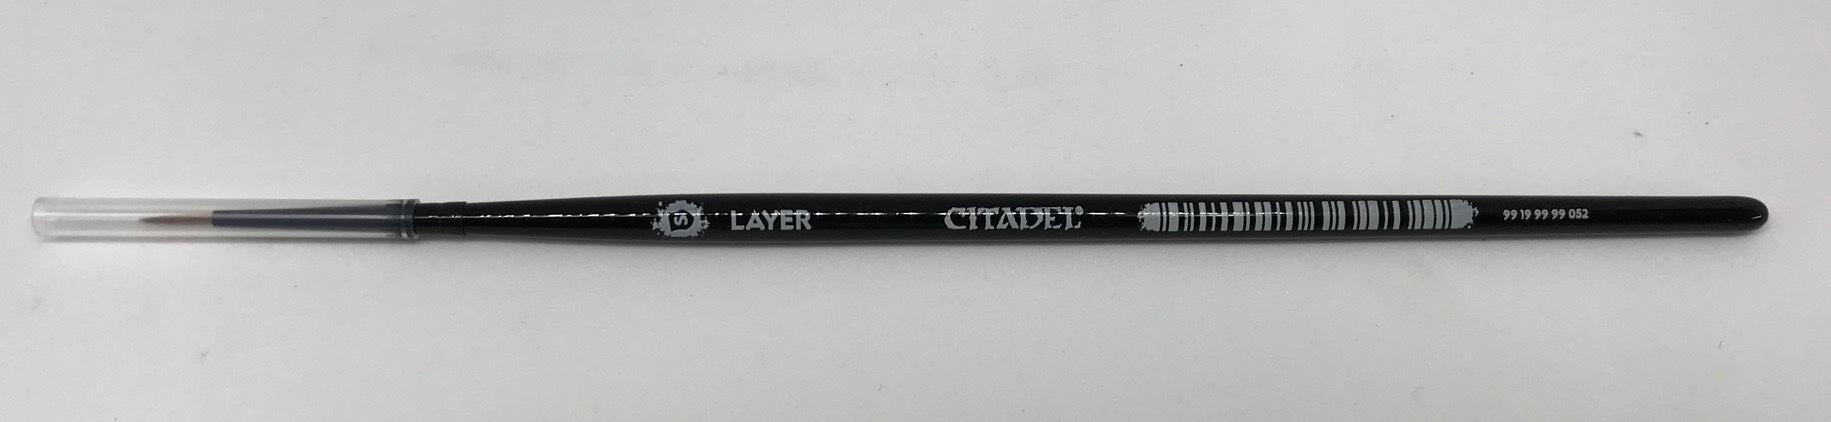 CITADEL SMALL LAYER BRUSH